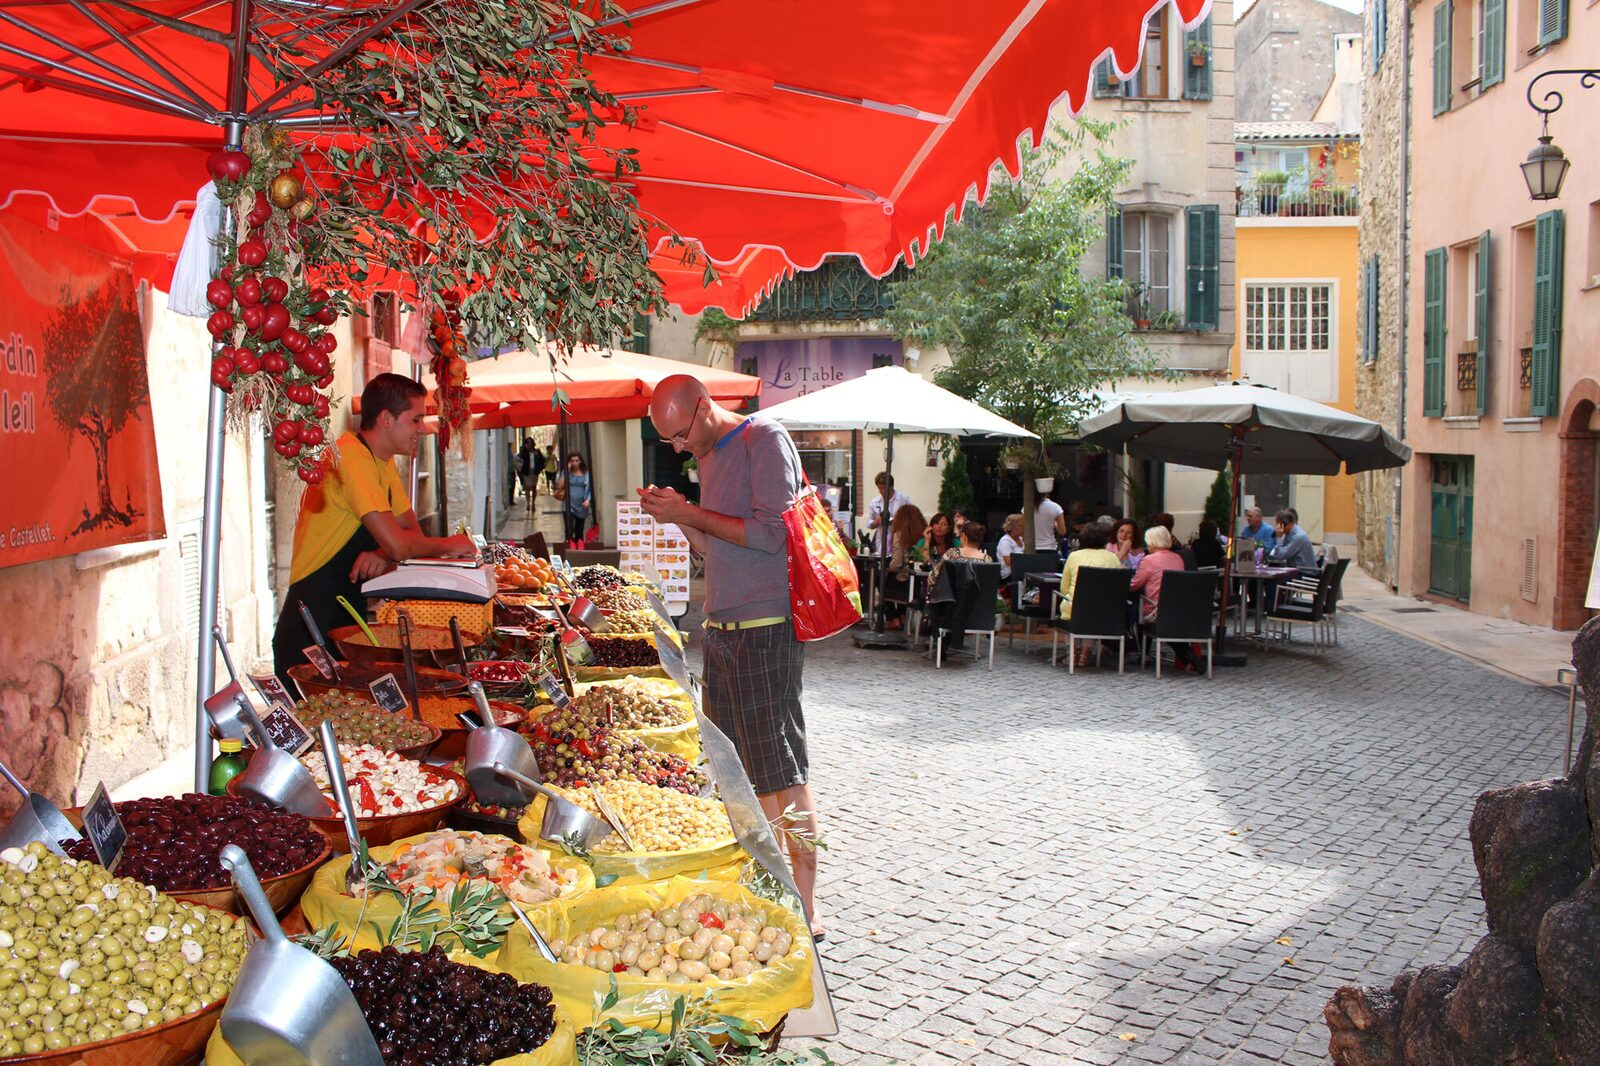 Vence markets